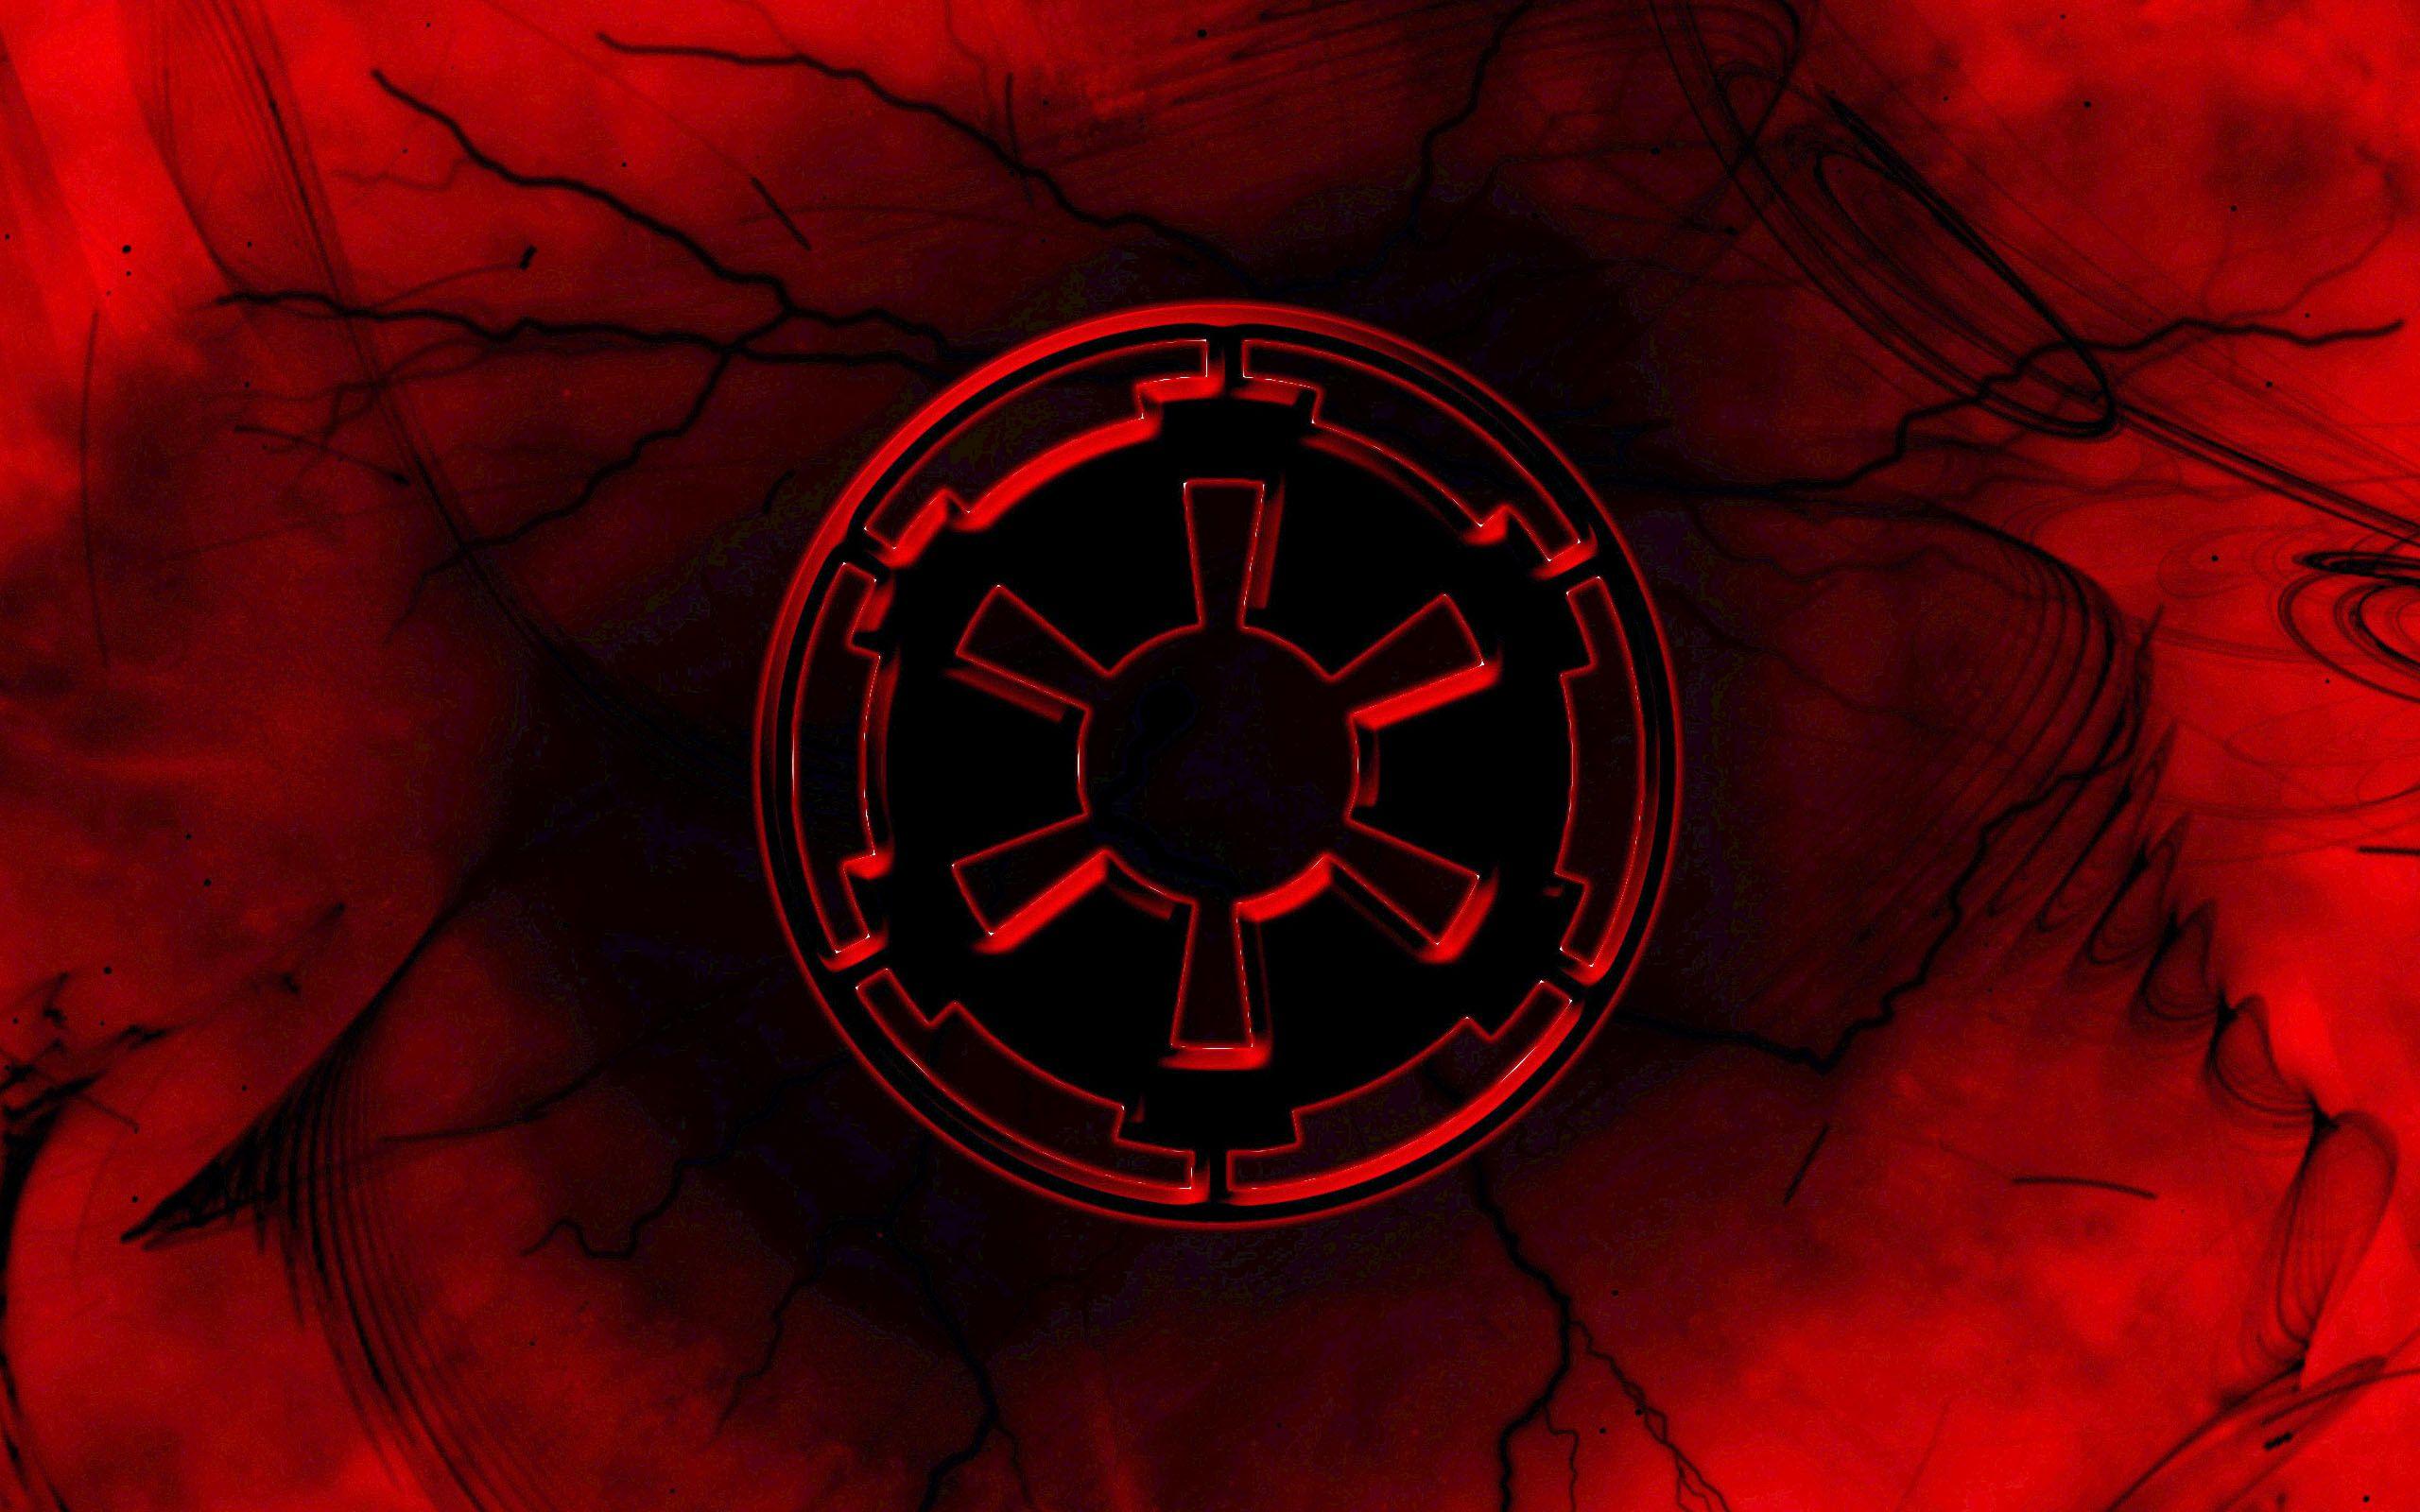 Star Wars Sith Background 2560x1600 Wallpaper Teahub Io